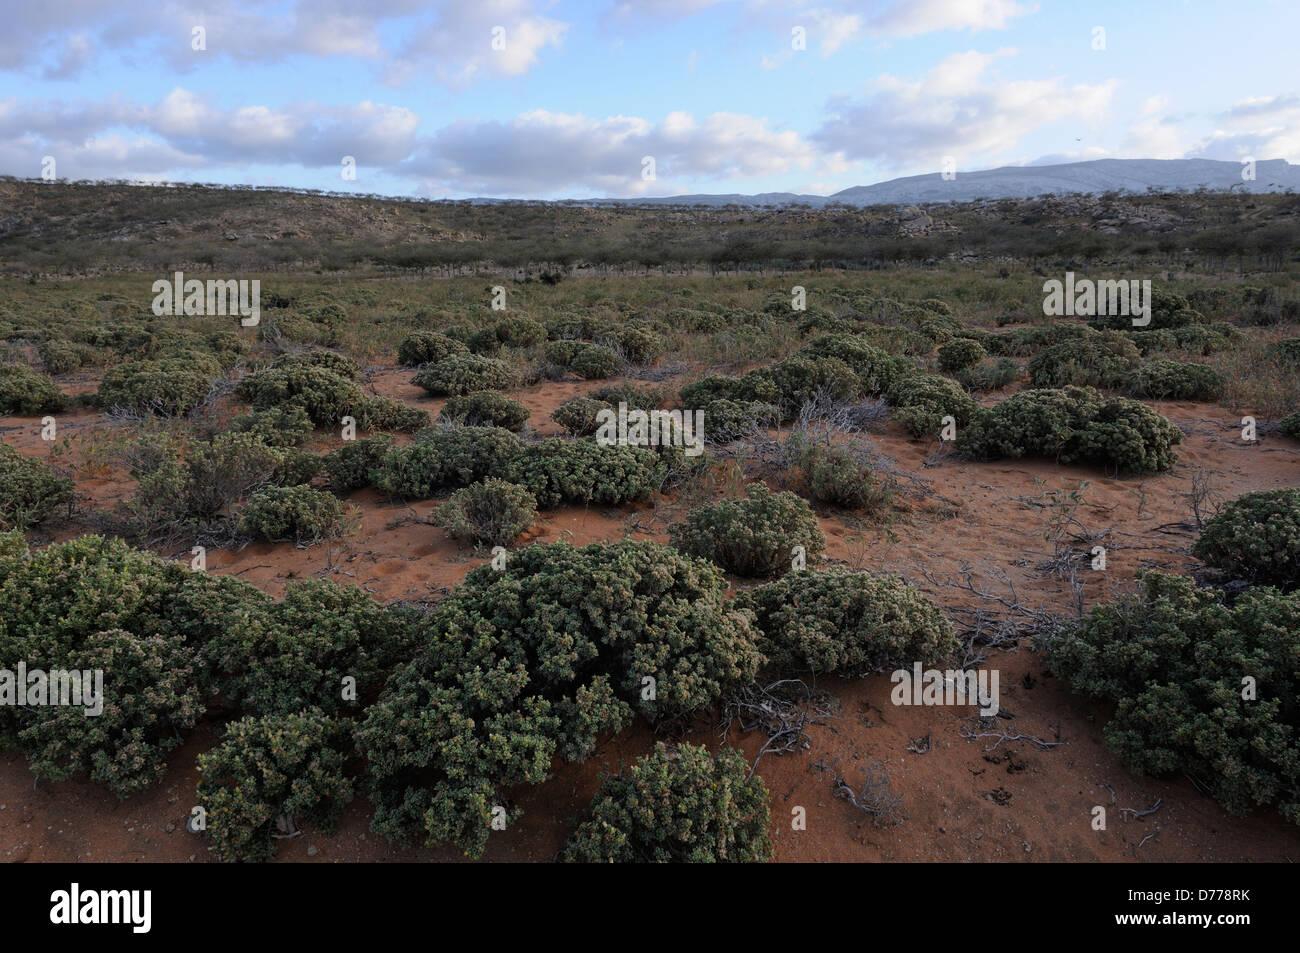 Shrub land of east Socotra in Yemen - Stock Image